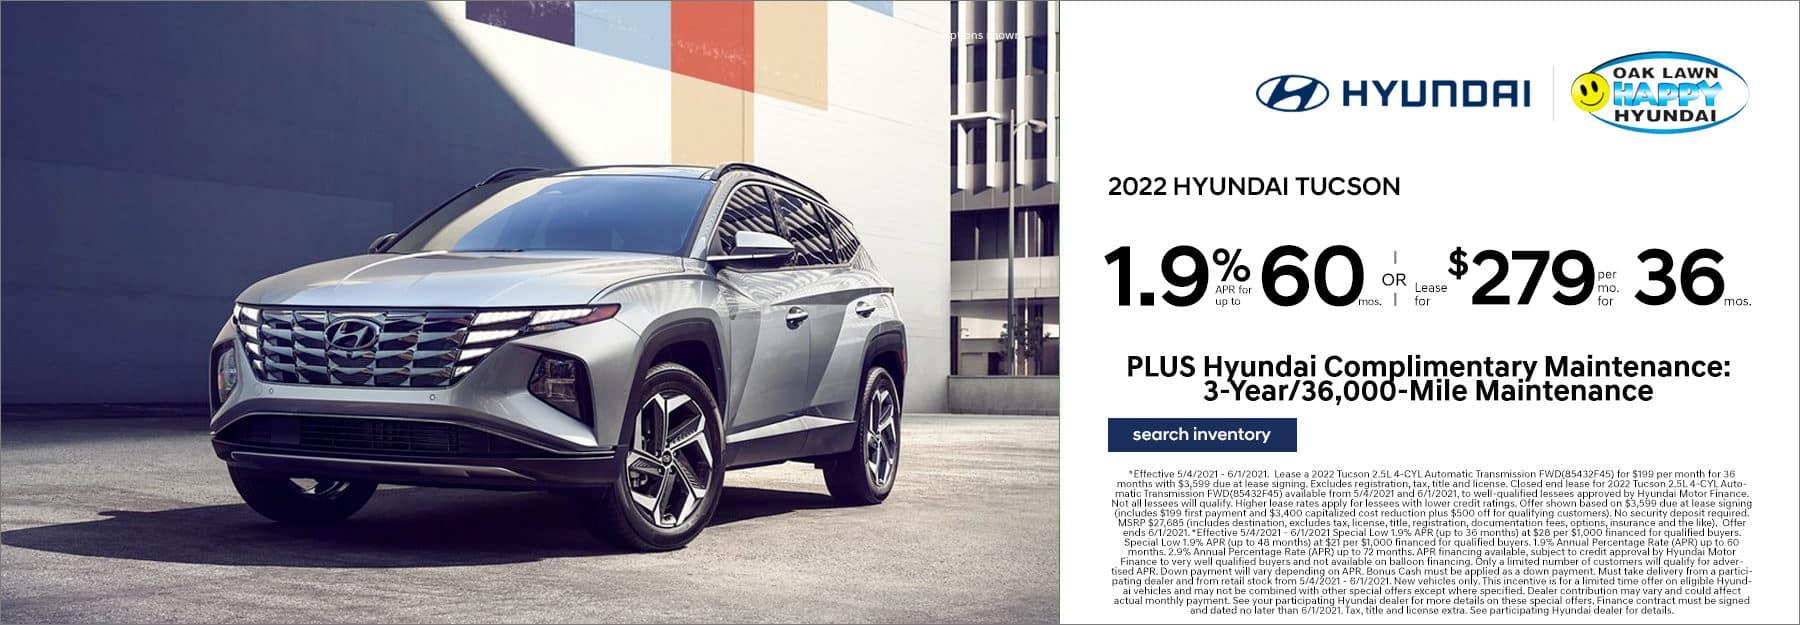 R_May_2021_222Tucson_HAPPY Hyundai